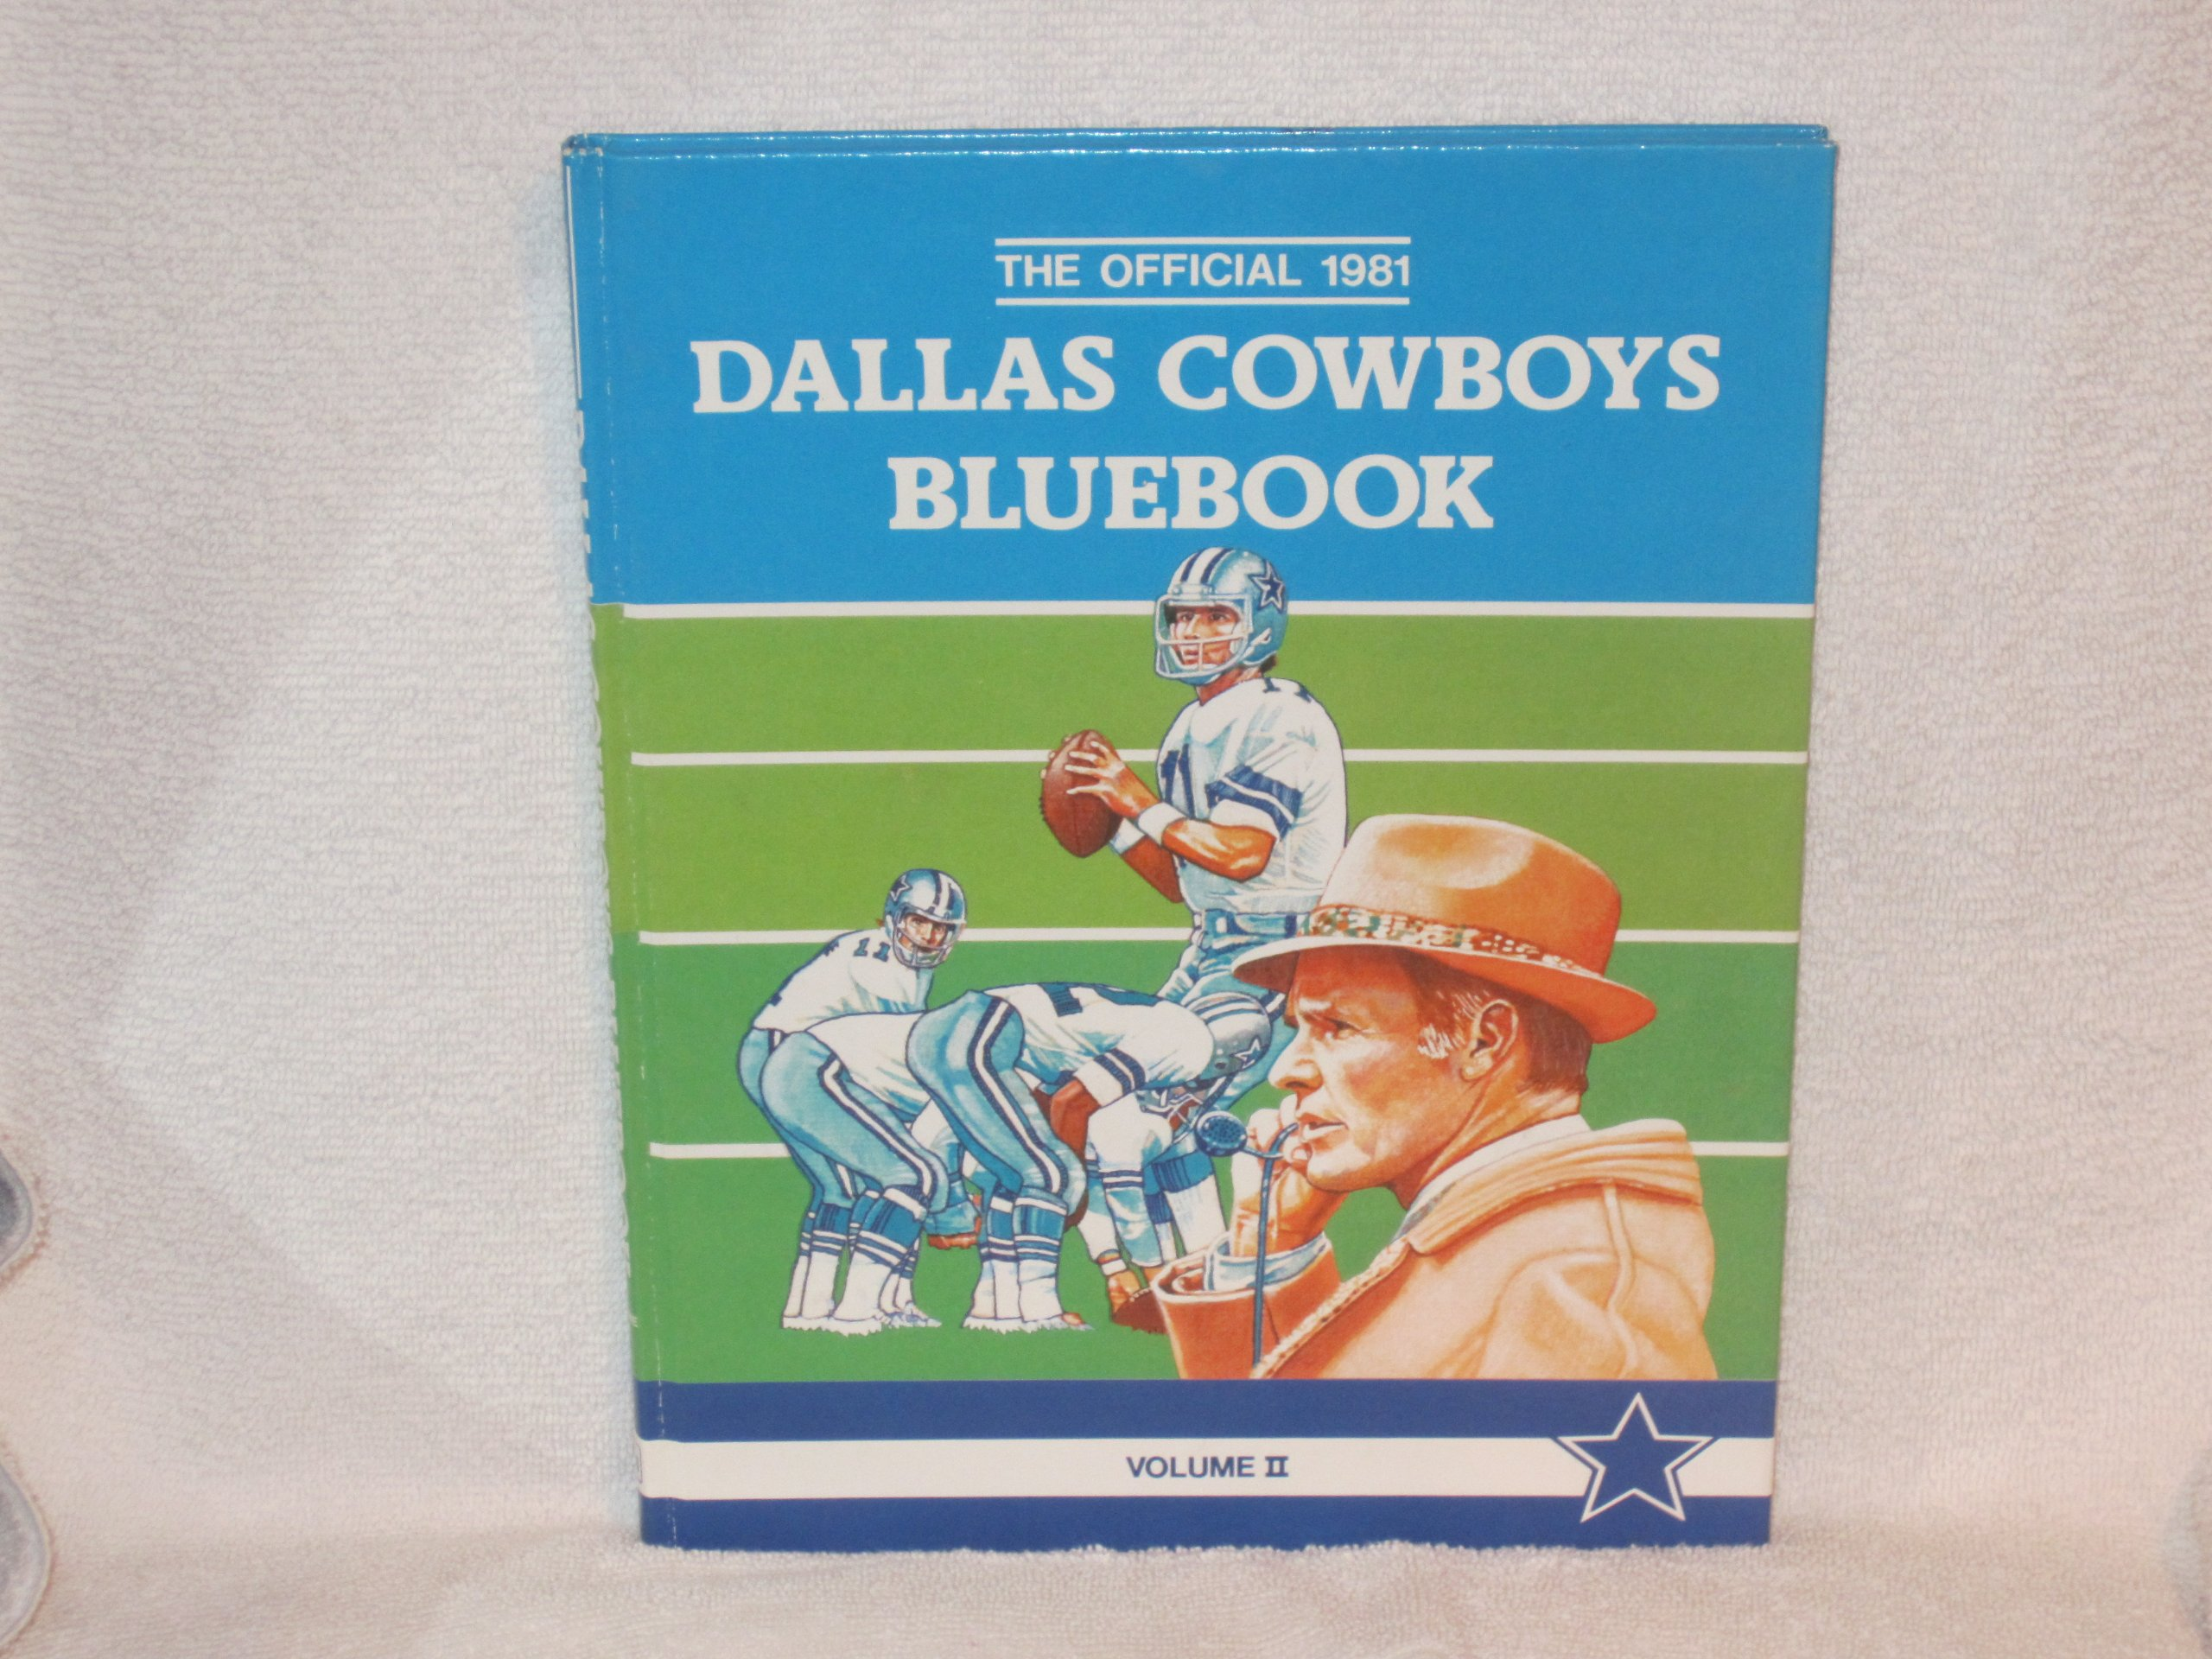 The Official 1981 Dallas Cowboys Bluebook (Vol II): Amazon.com: Books